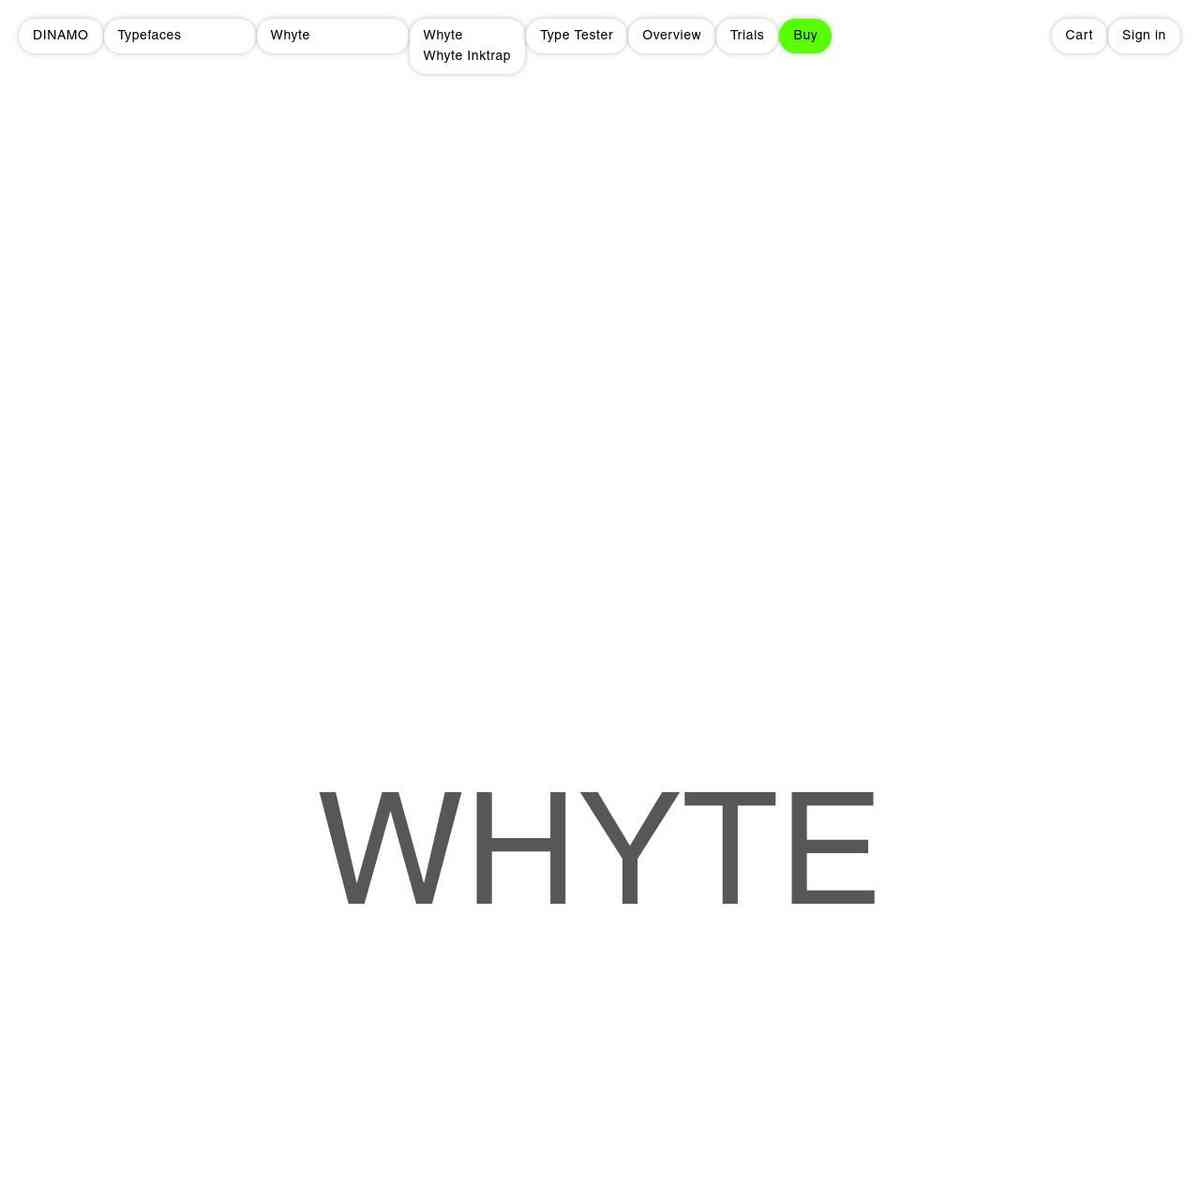 Whyte — Dinamo Typefaces